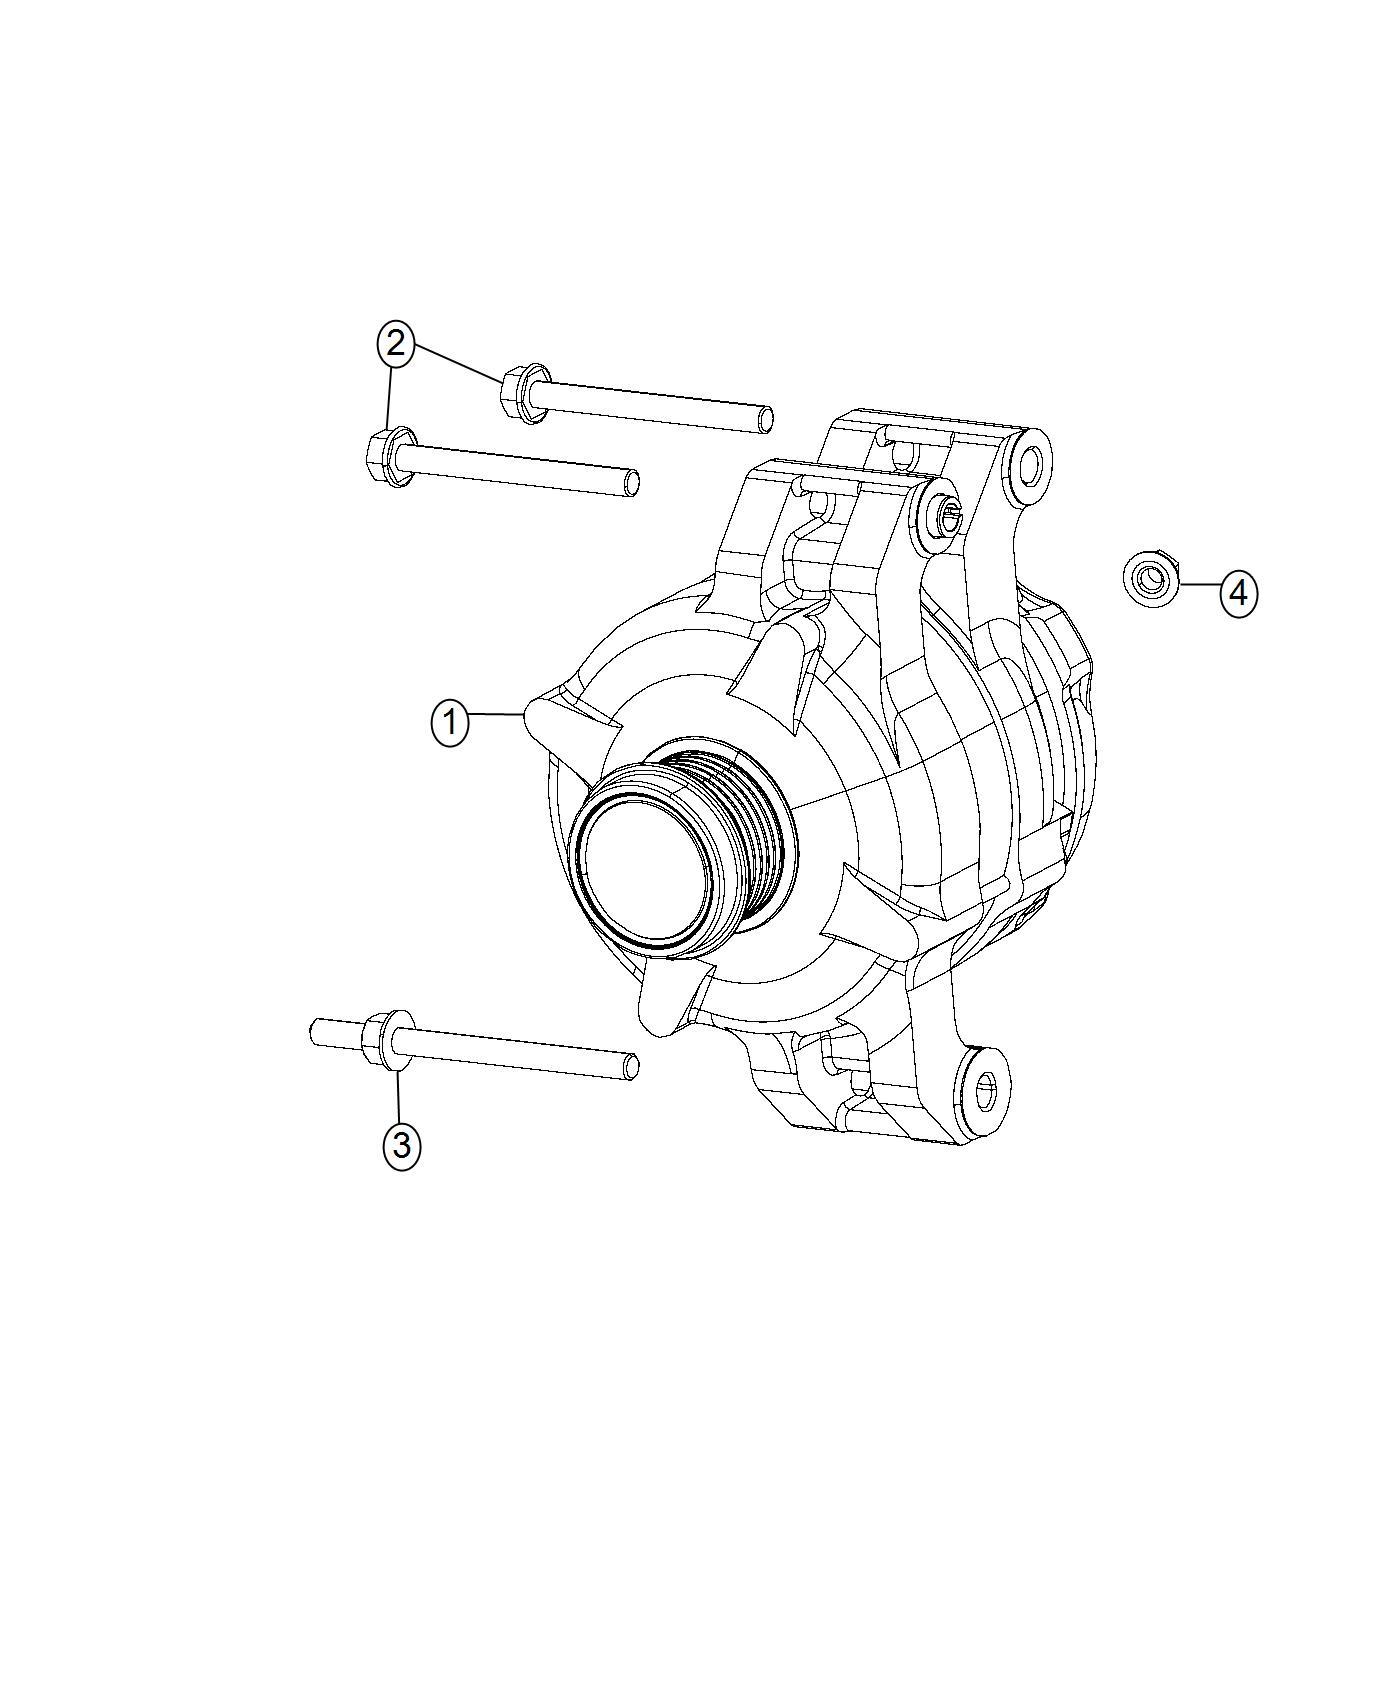 Jeep Grand Cherokee Generator. Engine. [220 amp alternator